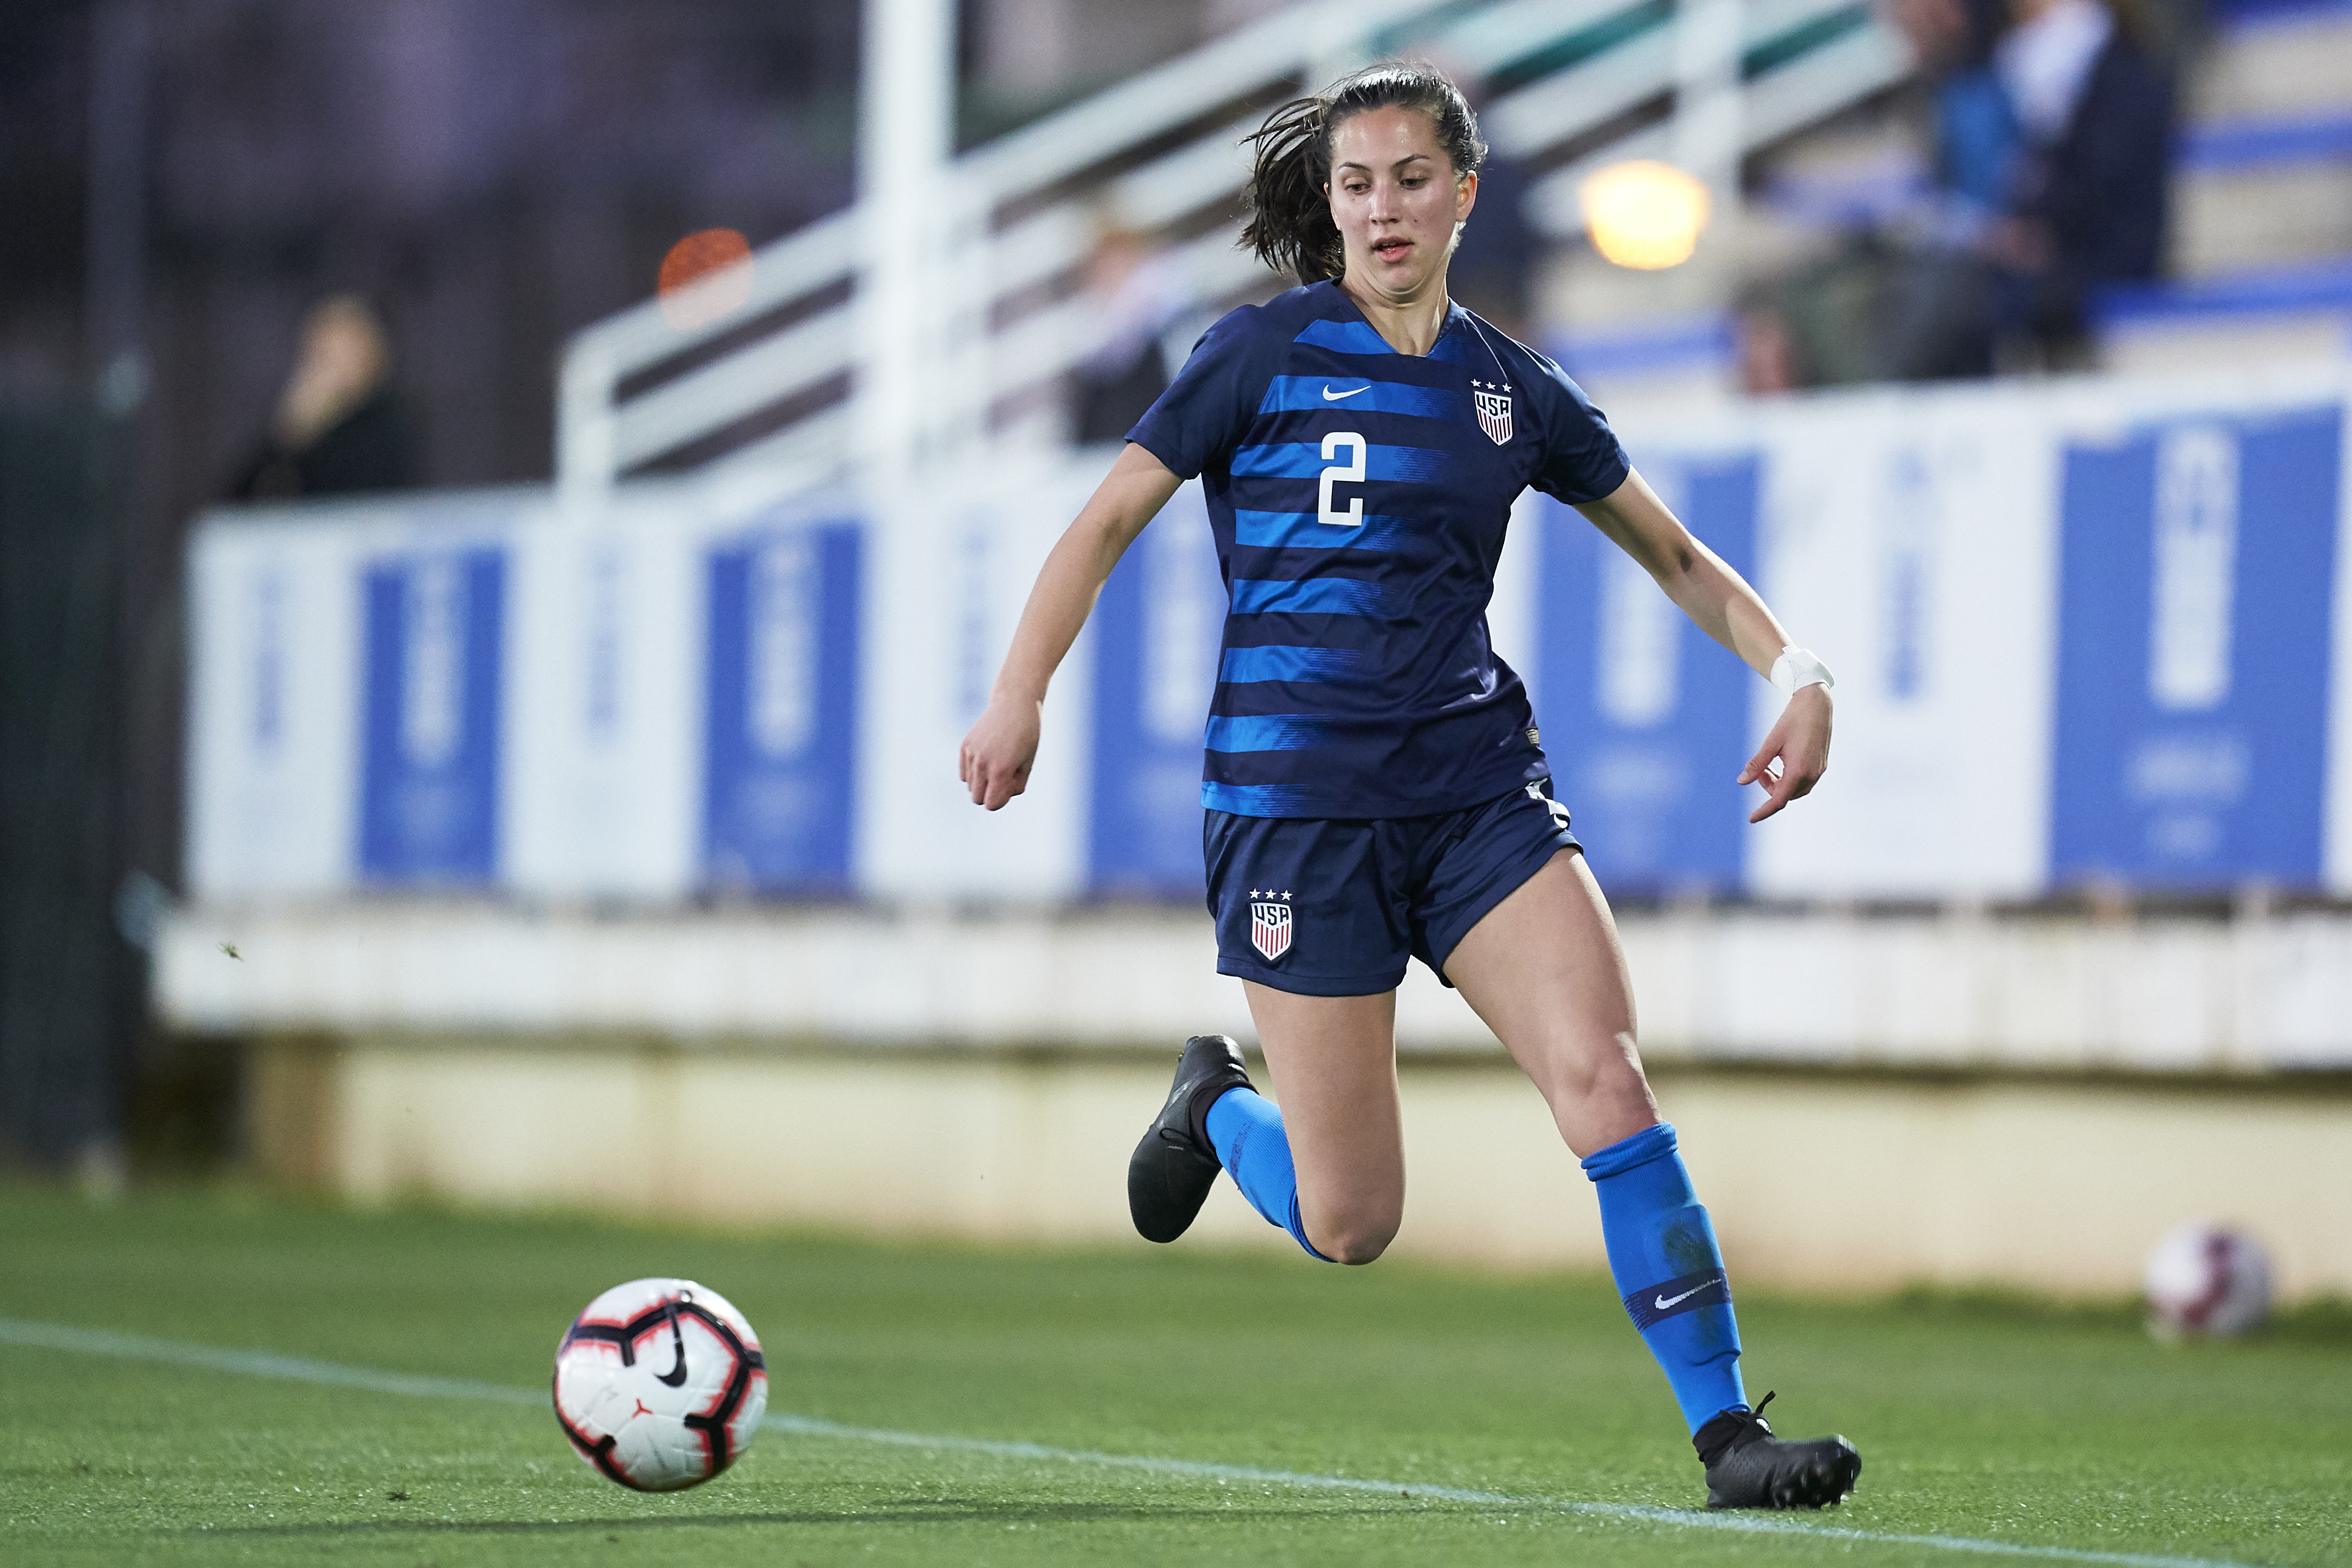 Netherlands U19 Women v USA U19 Women - International Friendly Match